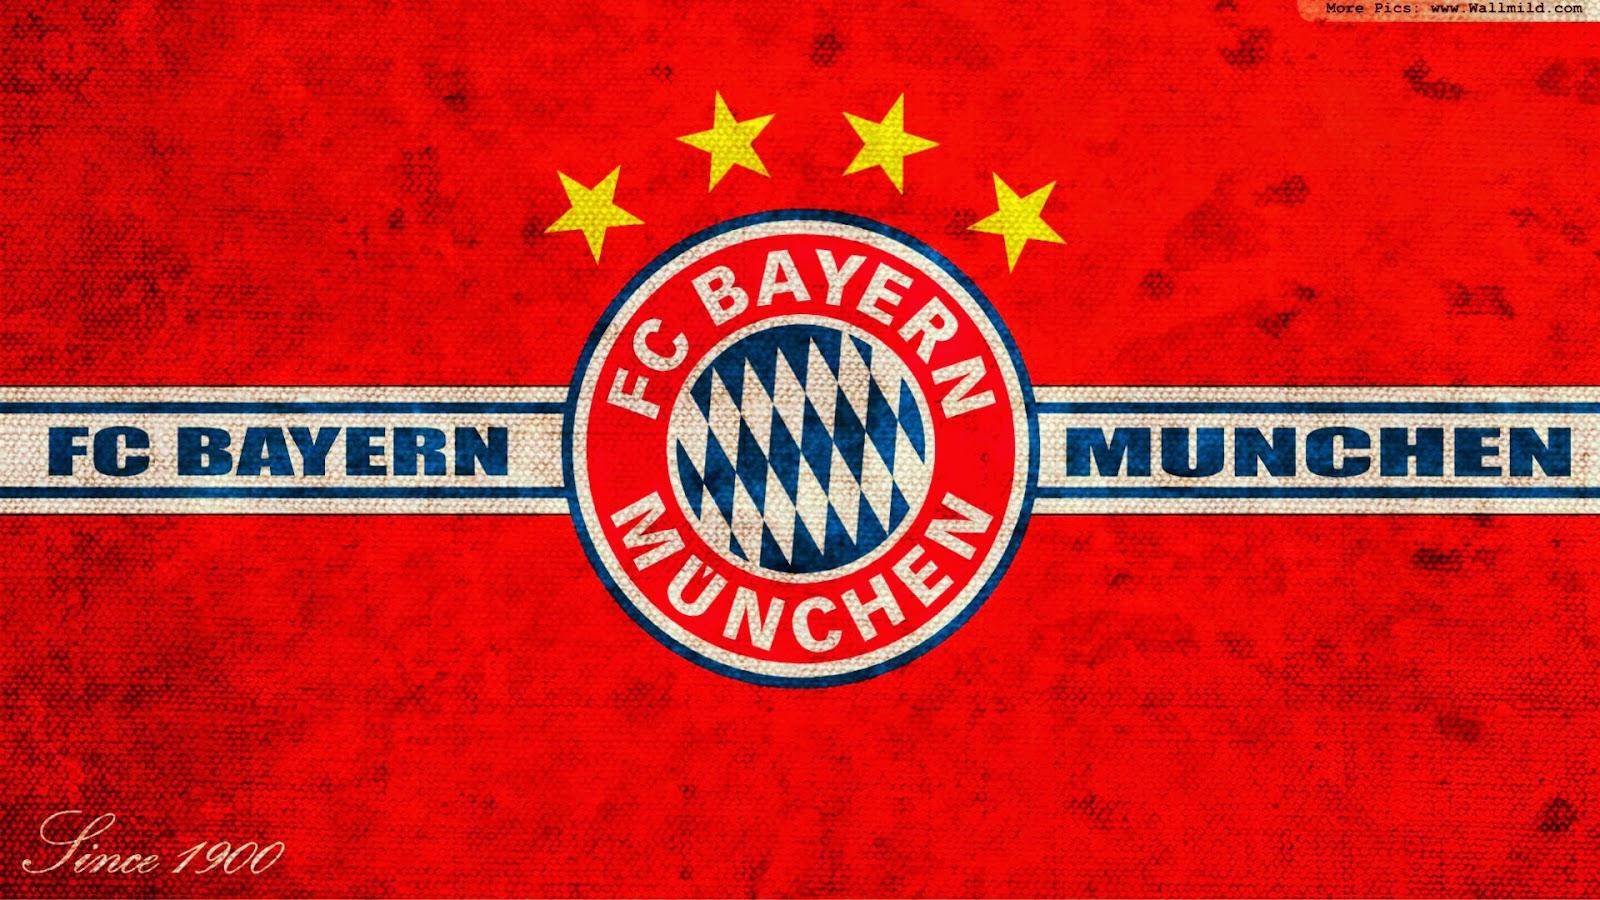 bayern munchen football club wallpaper football wallpaper hd. Black Bedroom Furniture Sets. Home Design Ideas